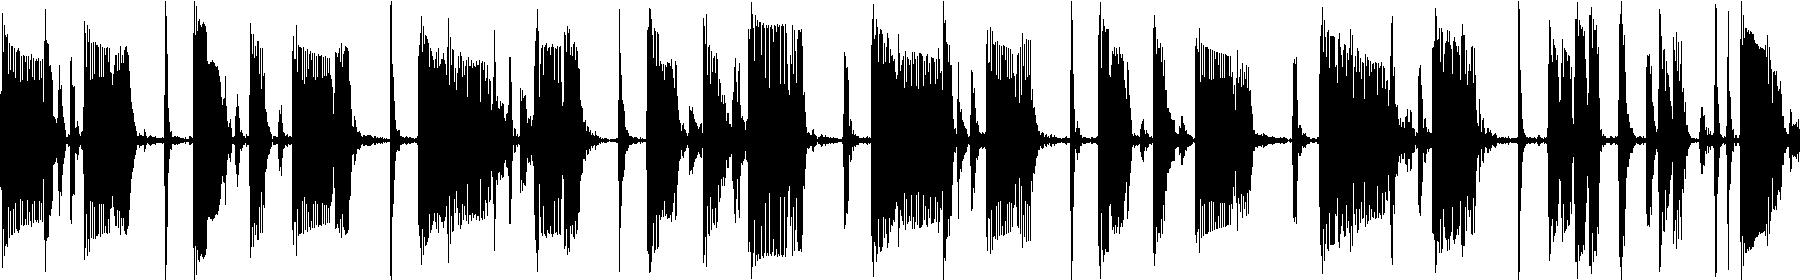 120 cfg 8bar sp02